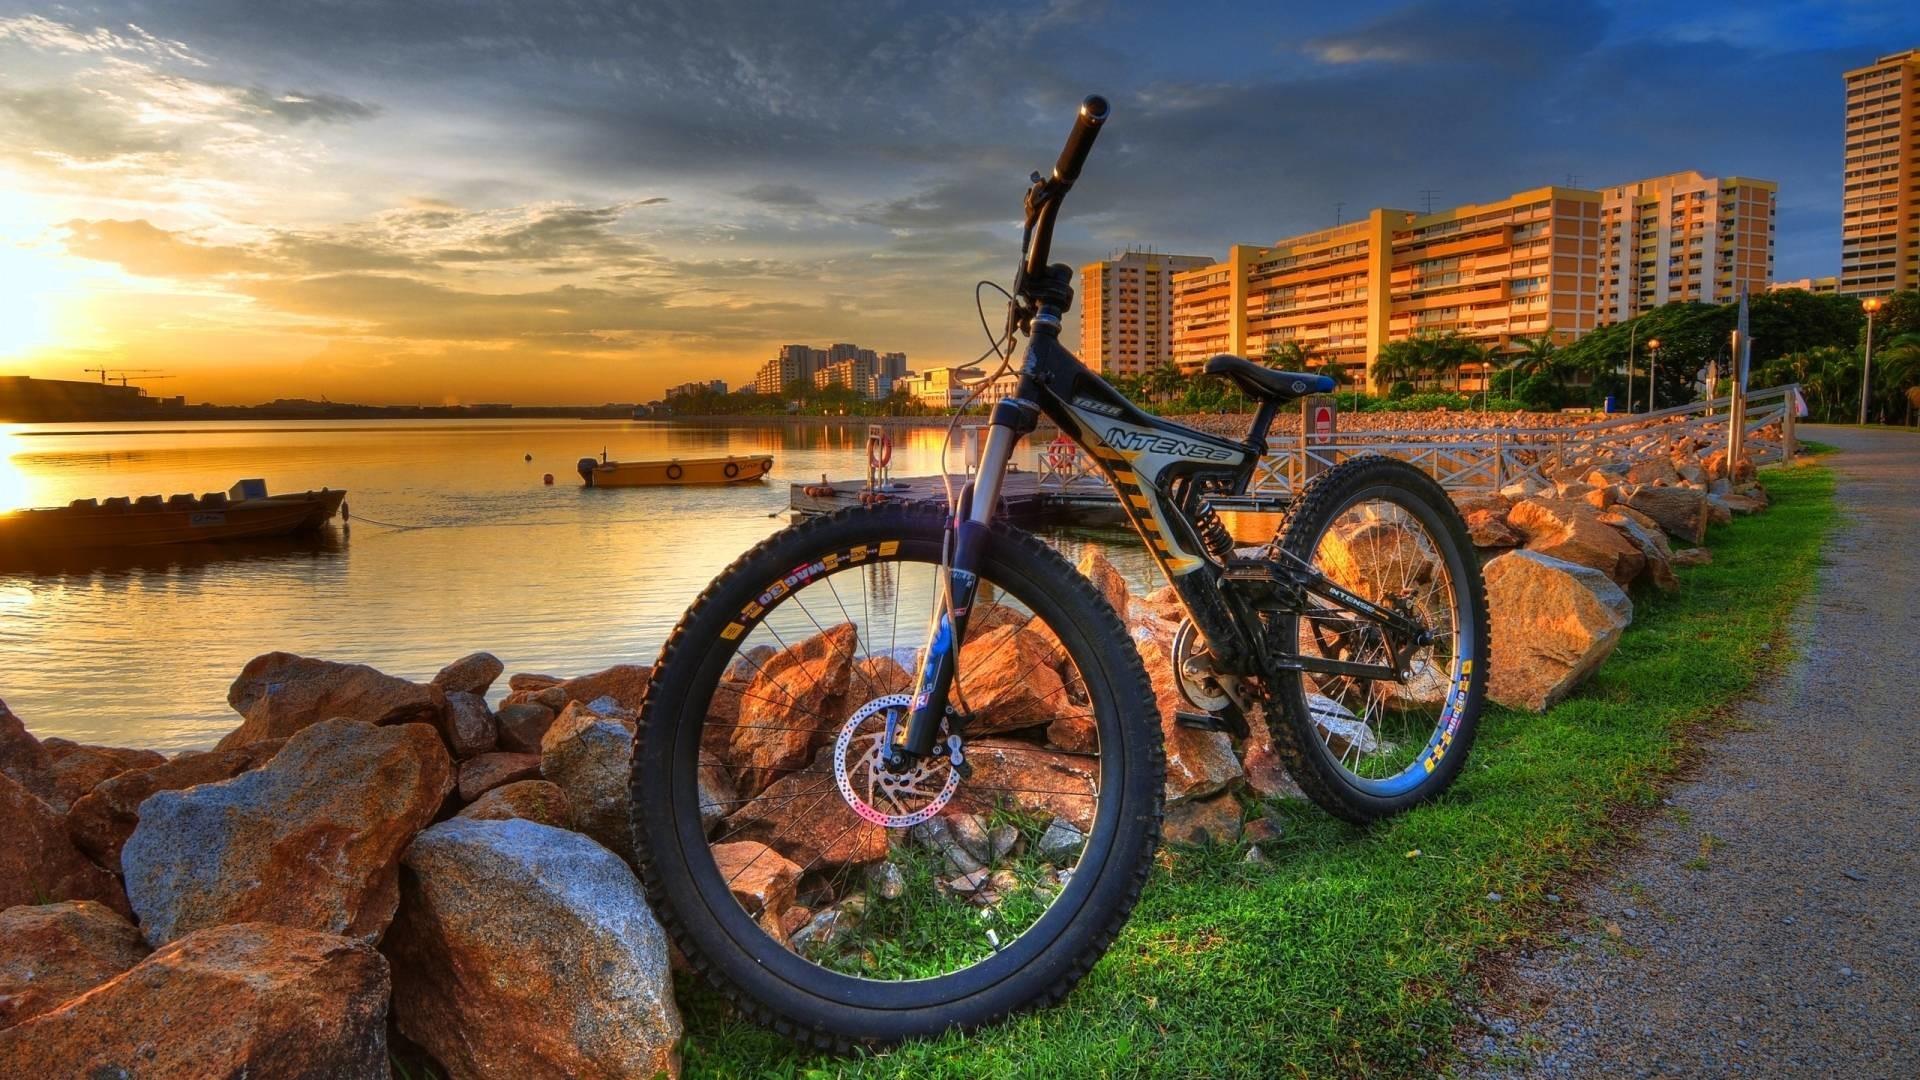 Natural 3D Bicycle HD Wallpaper 1080p #1802 Wallpaper | AWS HD .